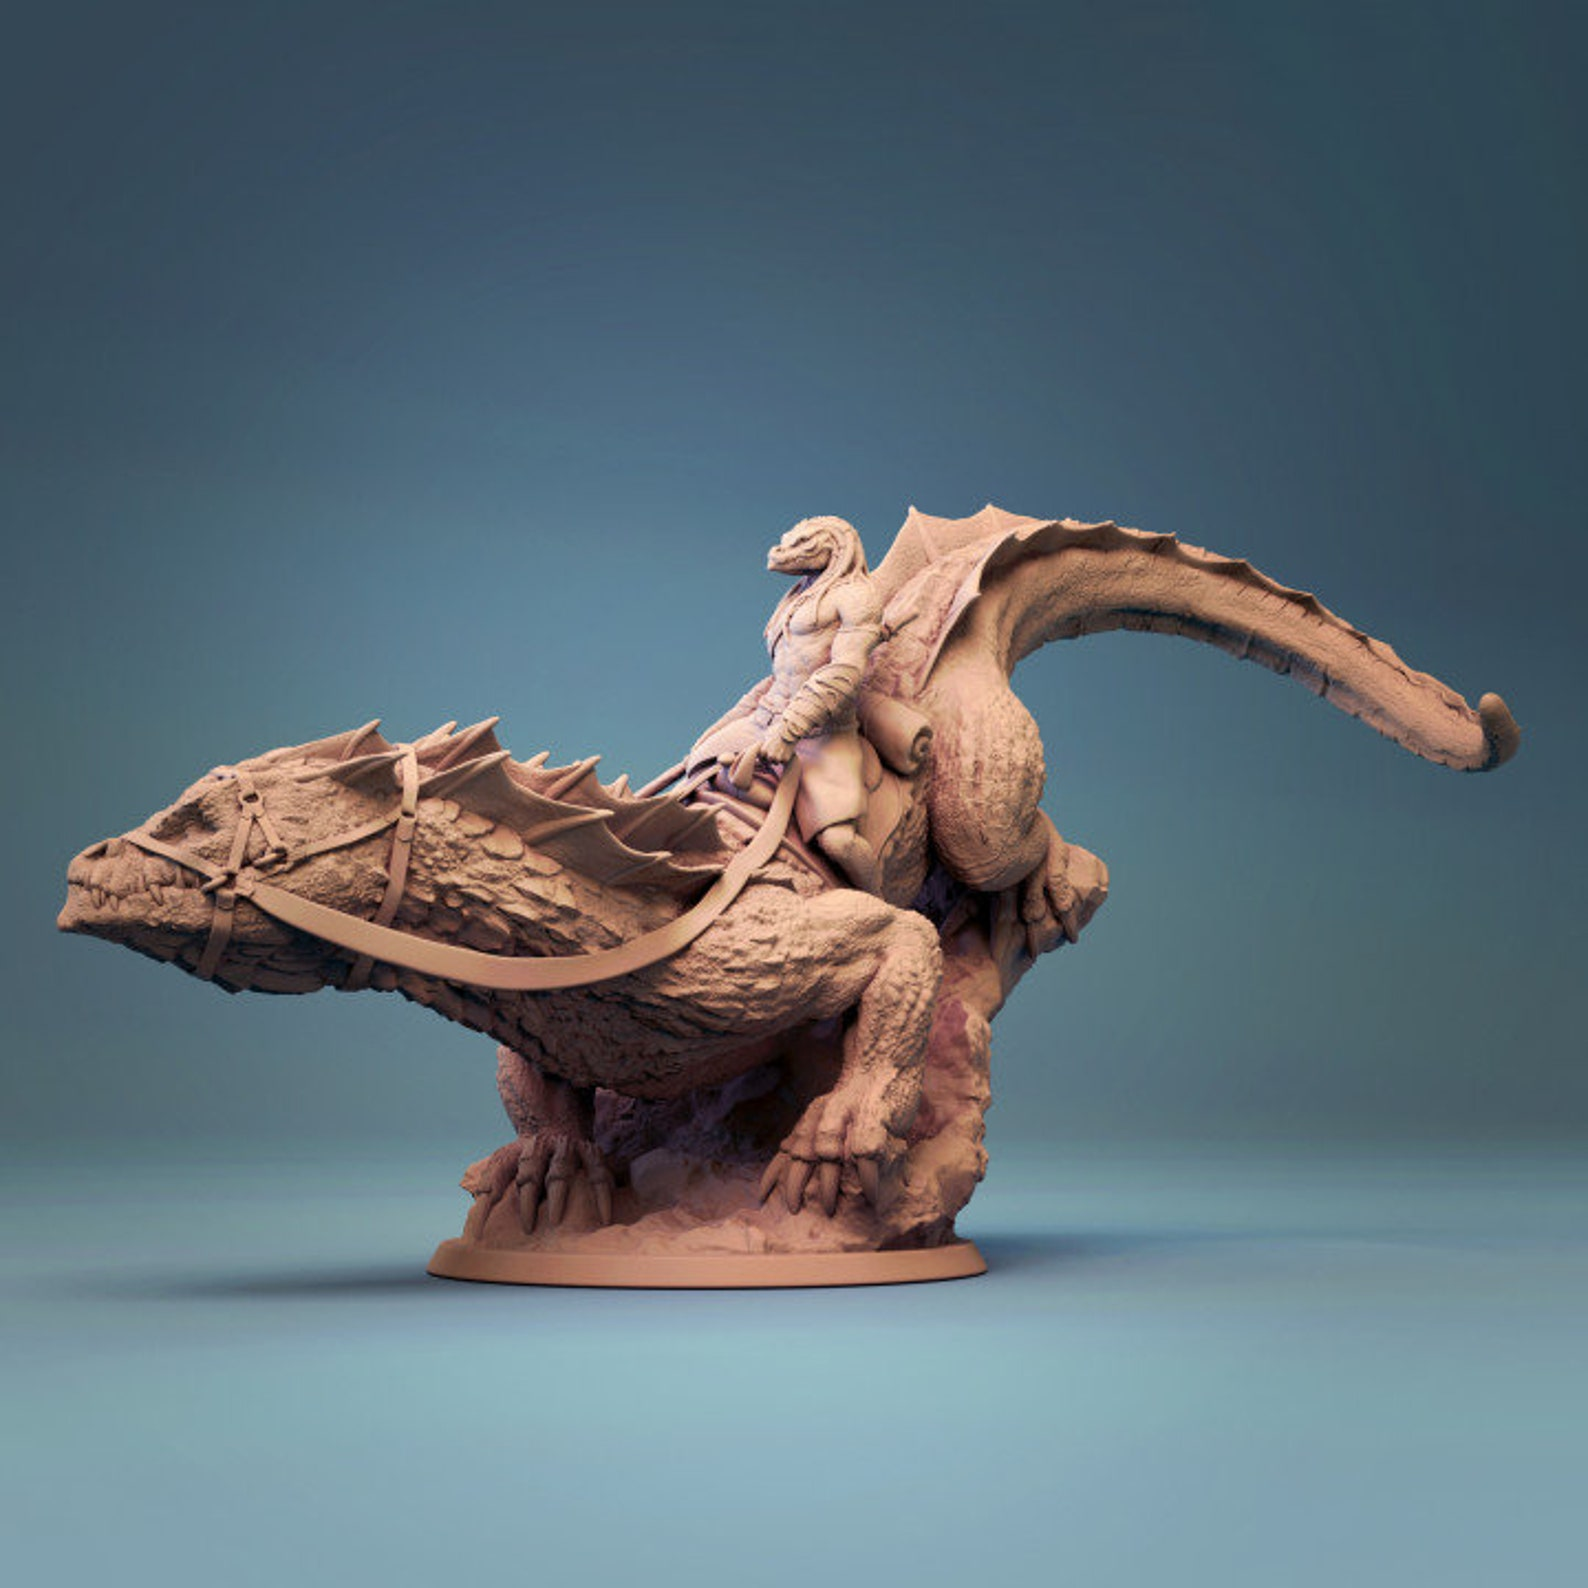 Giant Lizard Mounted 3D Printed Preprimed Miniature Model